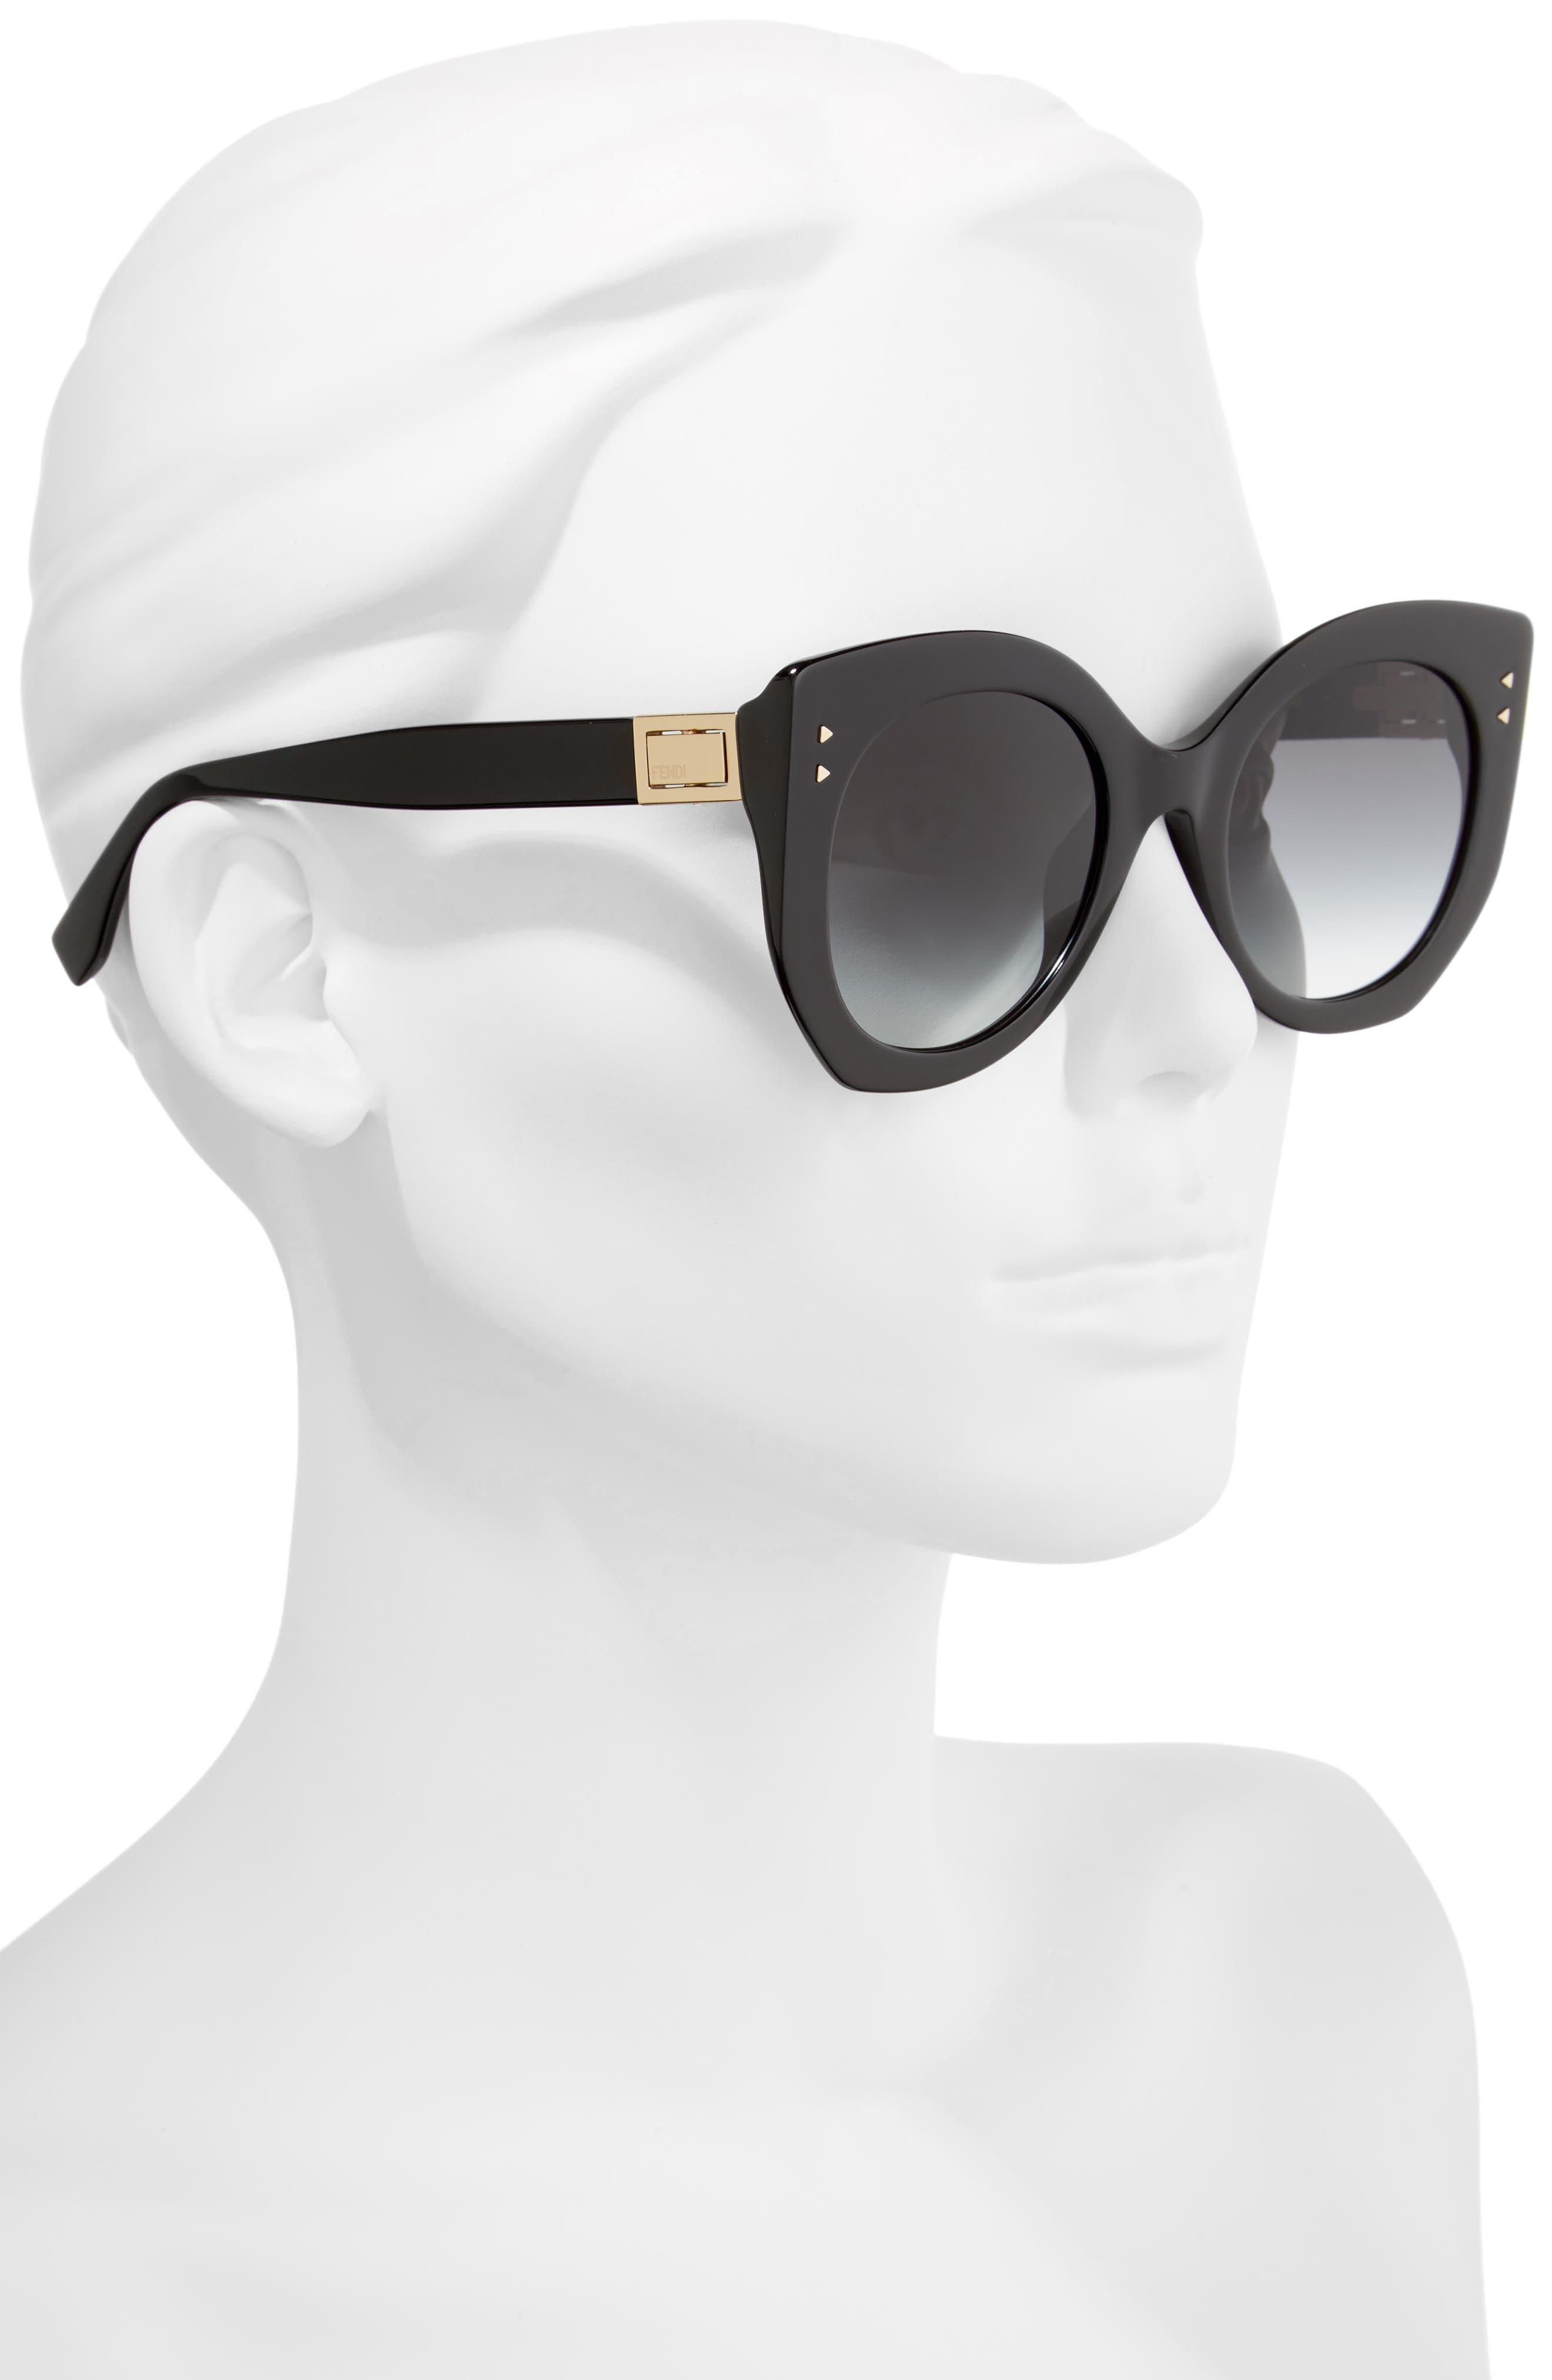 52mm Butterfly Sunglasses,                             Alternate thumbnail 2, color,                             Black